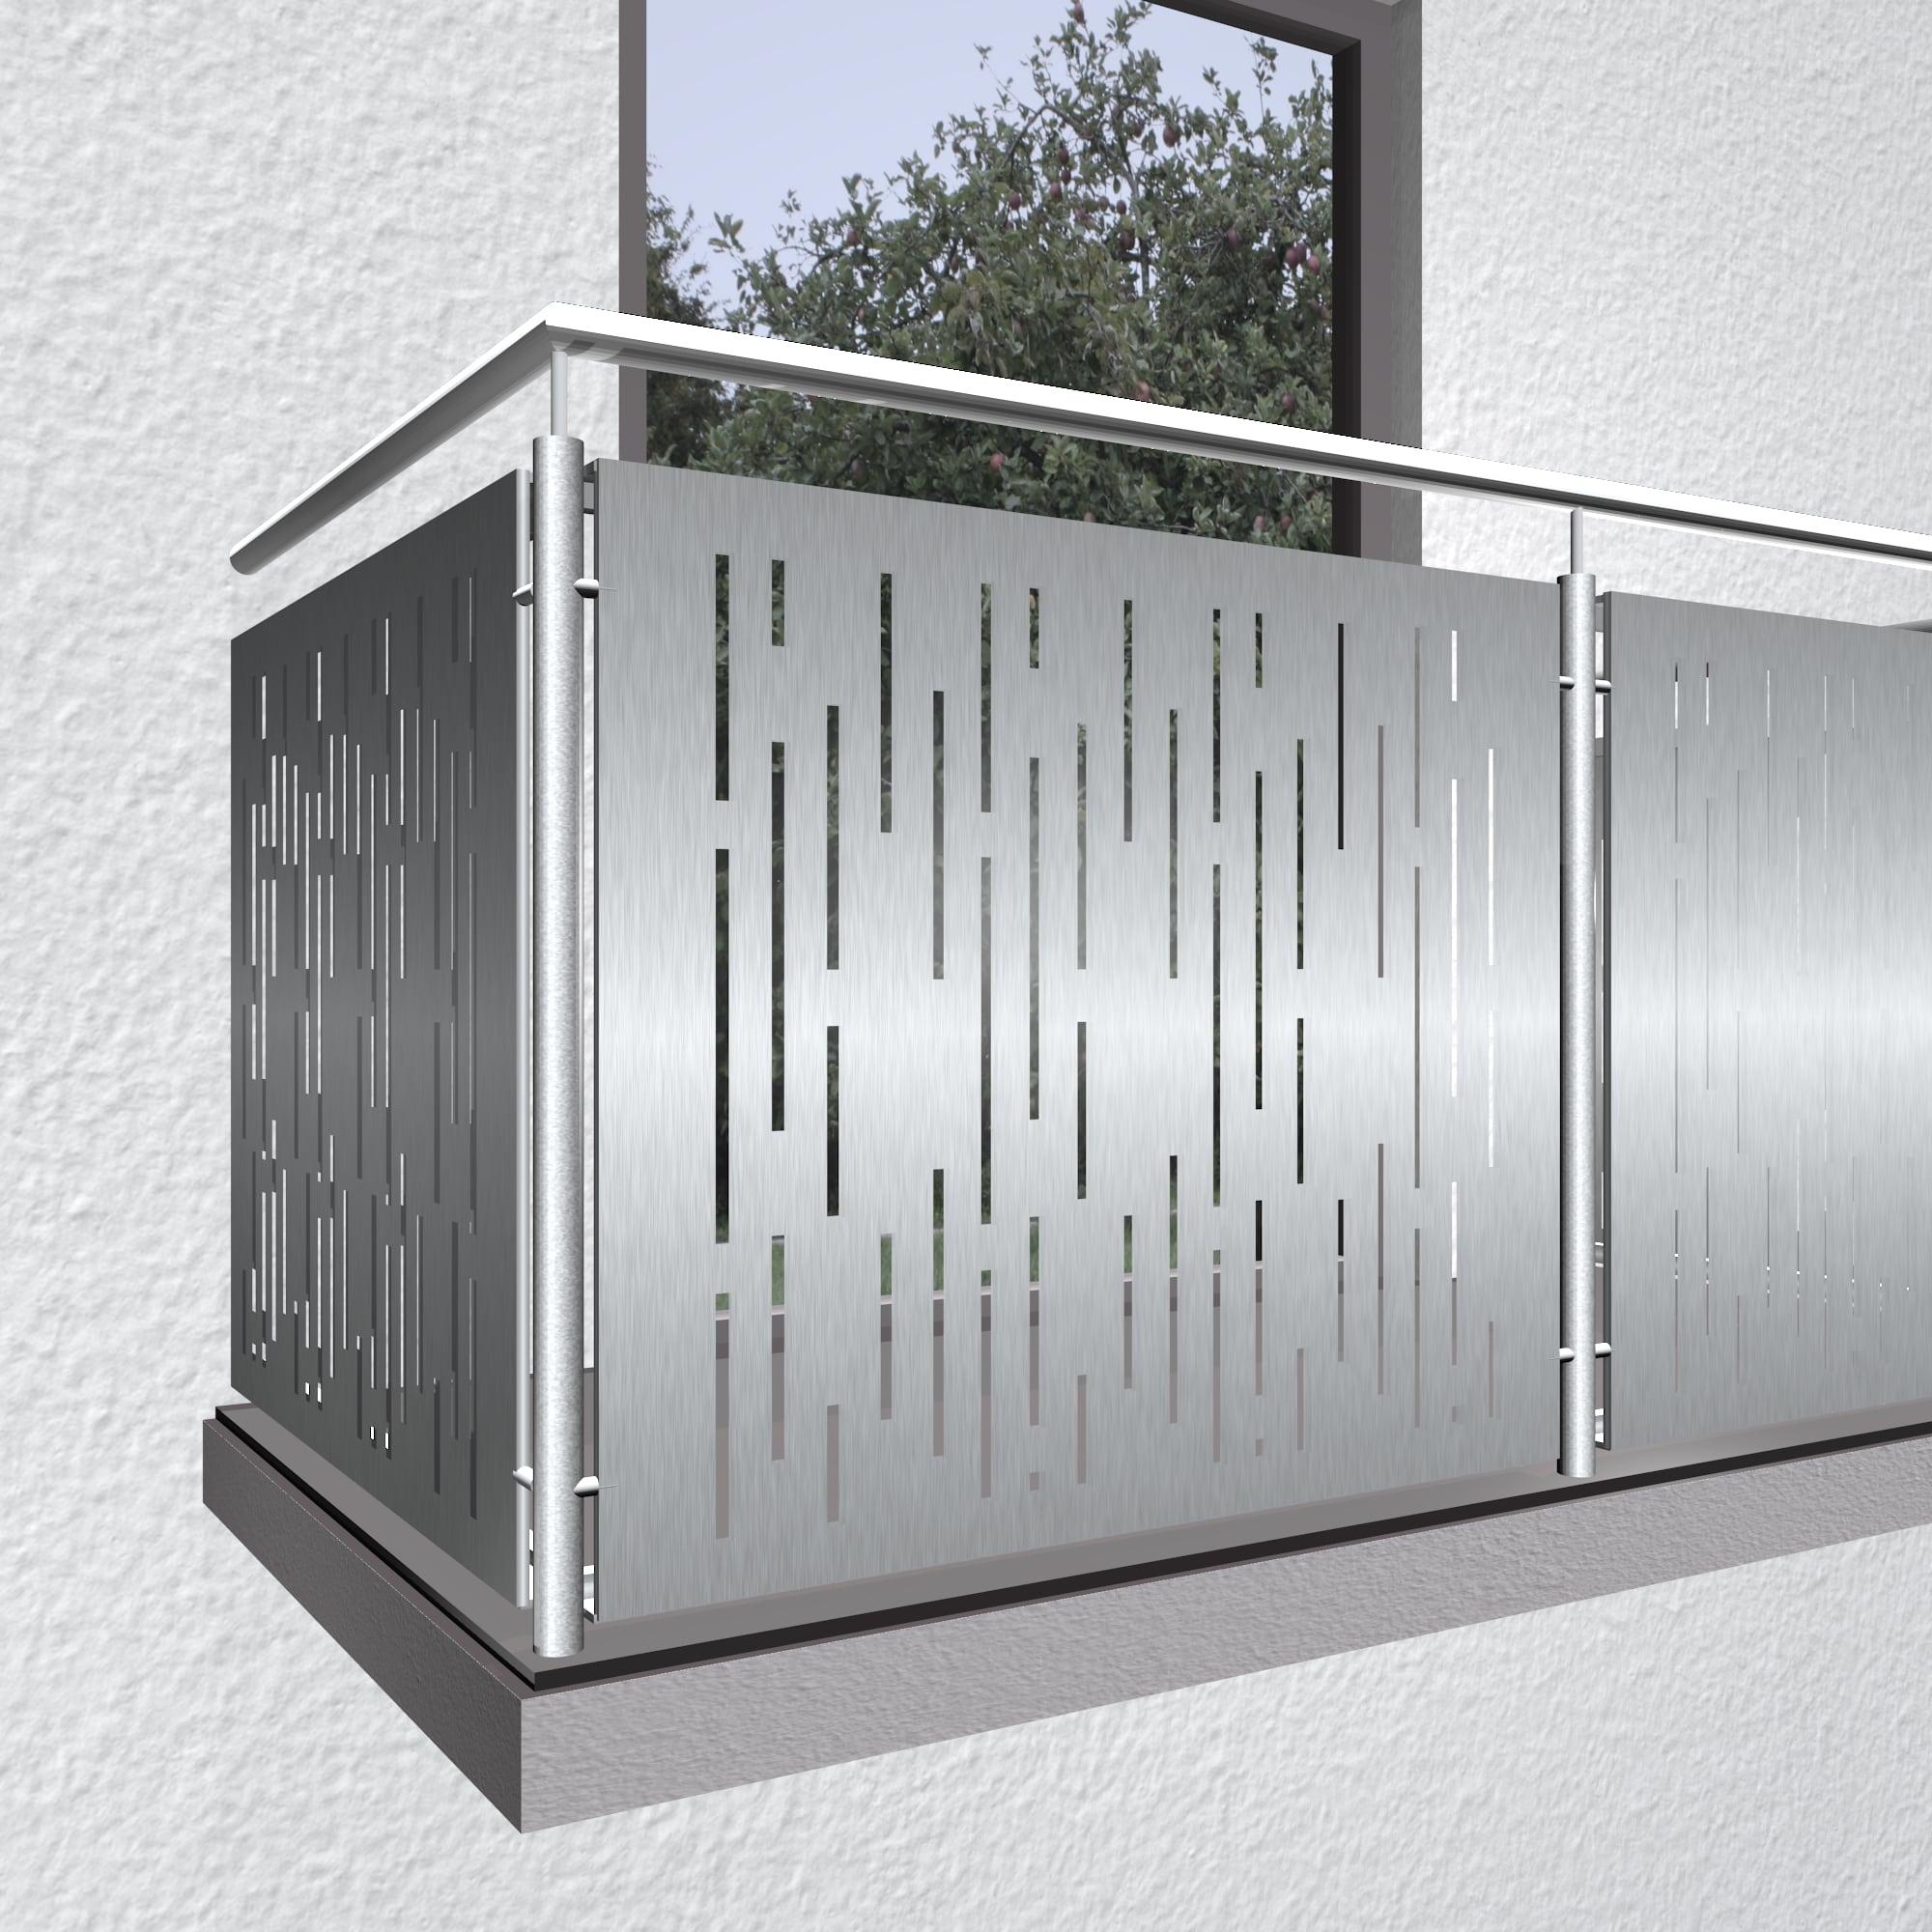 Balkonverkleidung Edelstahl SF VE